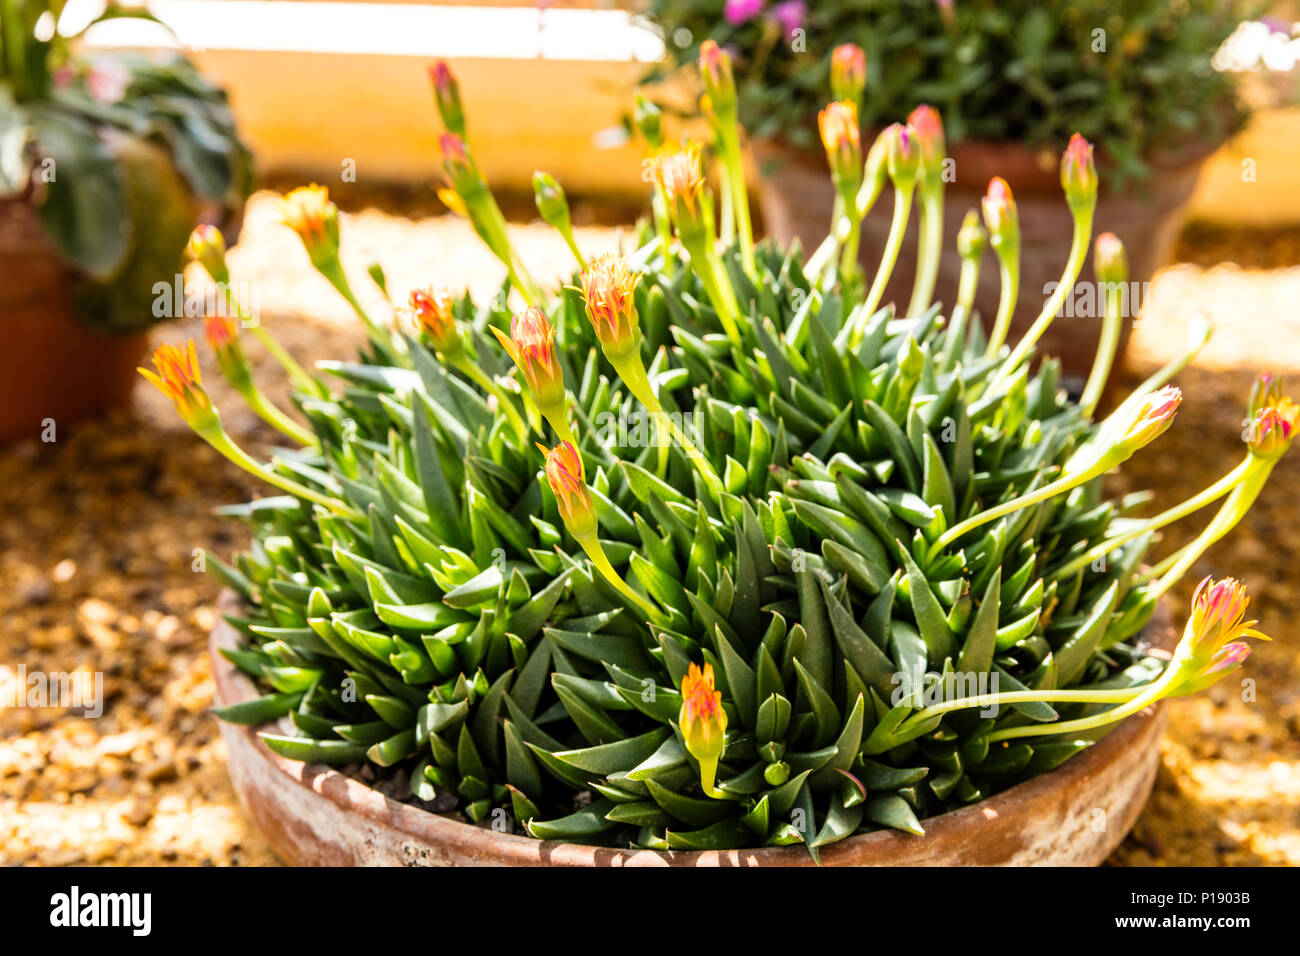 bergeranthus glenensis, succulent, Hereroa glenensis, plant flowering, flower, flowering Hereroa glenensis, bergeranthus glenensis plant, bergeranthus Stock Photo